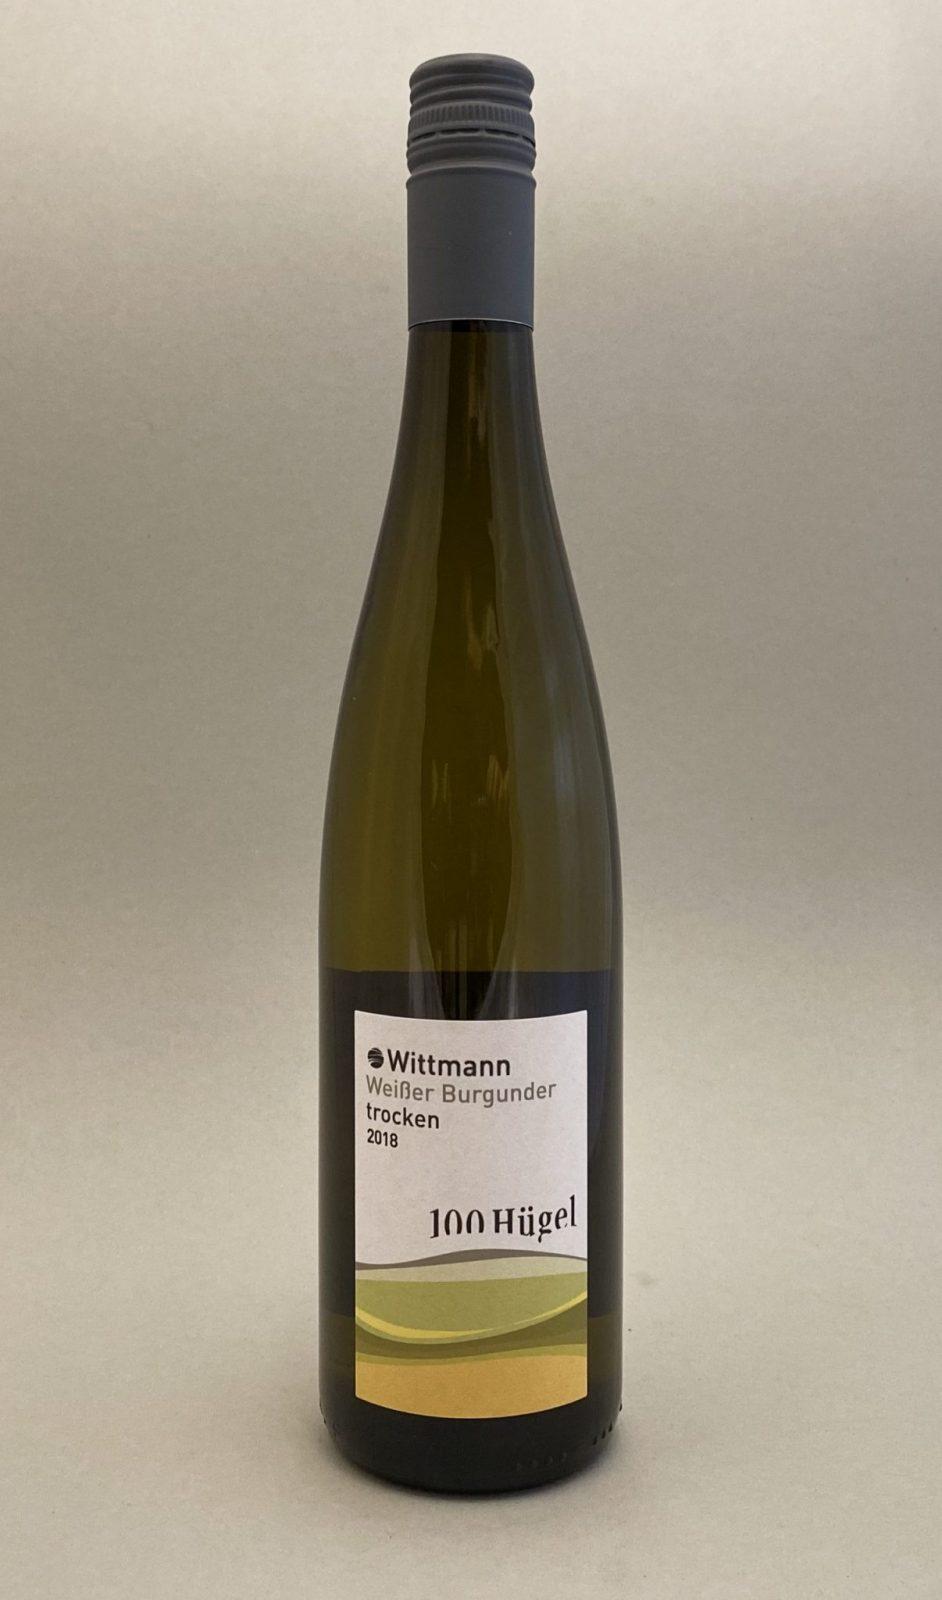 WITTMANN 100 Hügel Weißer Burgunder 2018, vinoteka Bratislava Sunny wines slnecnice mesto, petrzalka, vino biele z Nemecka